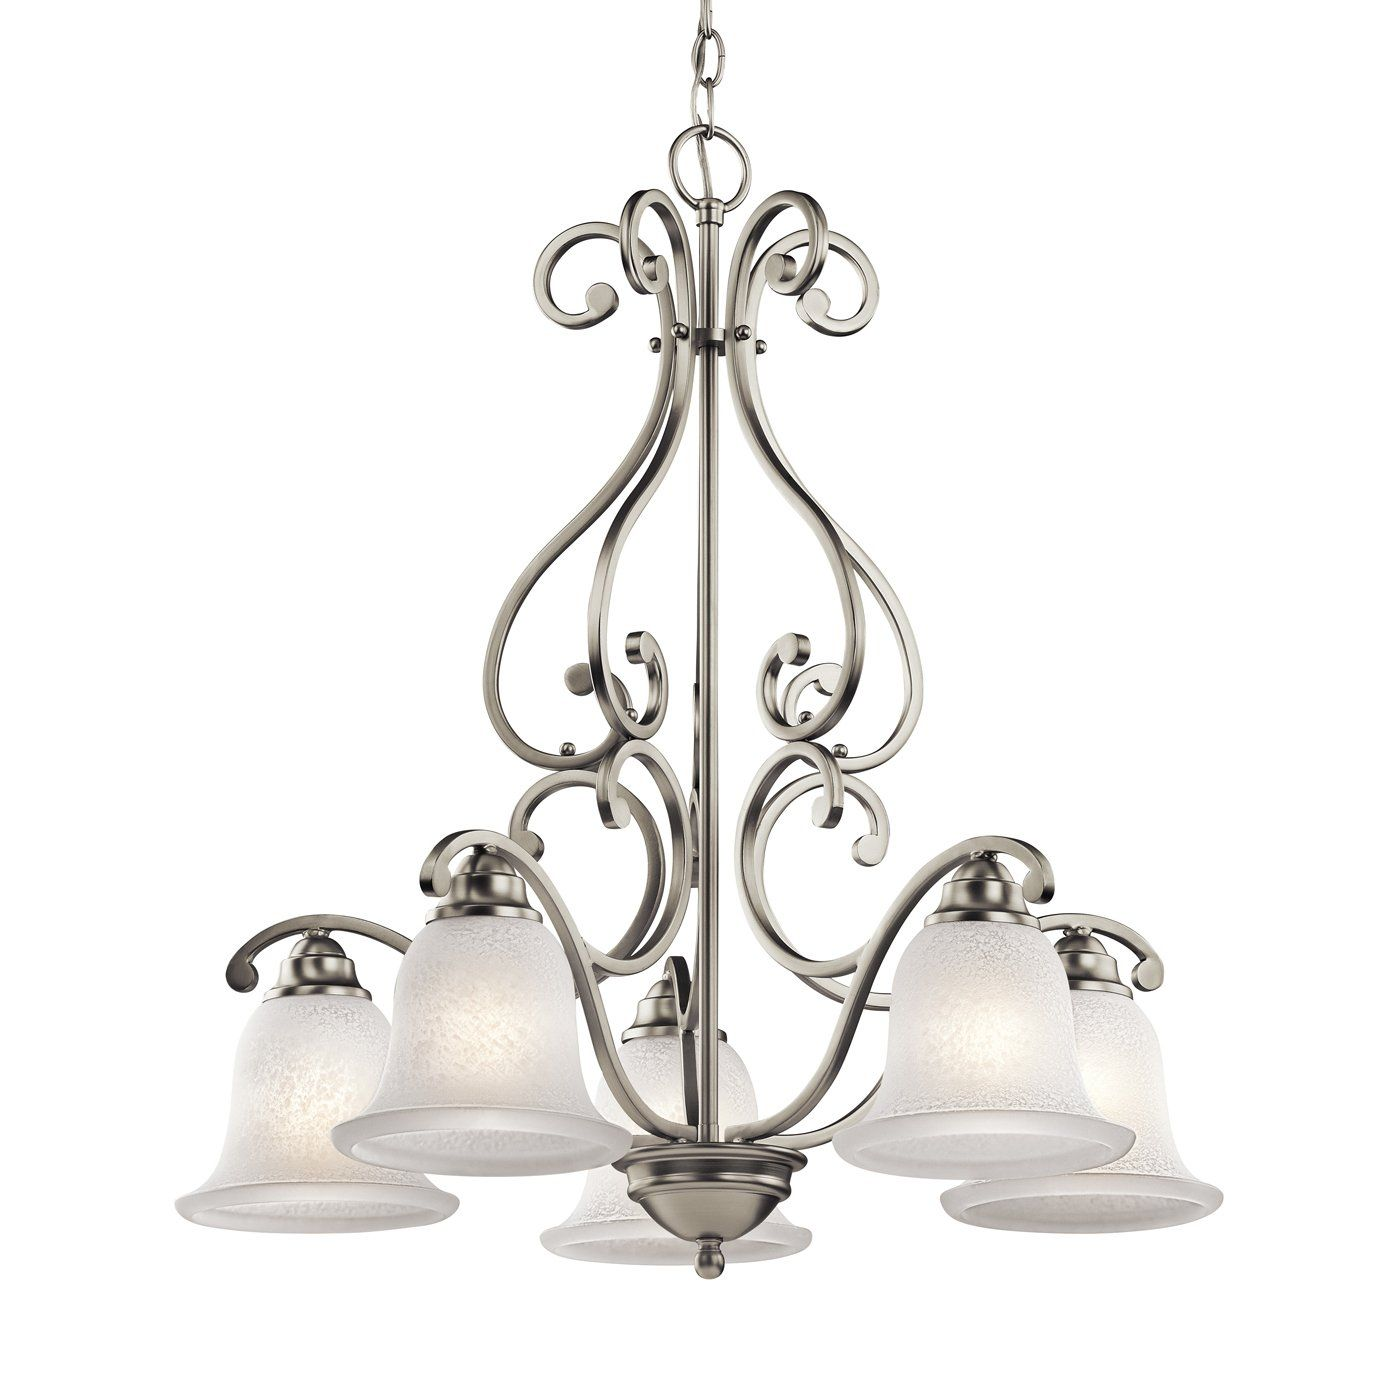 Kichler lighting 43225ni camerena 5 light downlight chandelier kichler lighting 43225ni camerena 5 light downlight chandelier arubaitofo Images